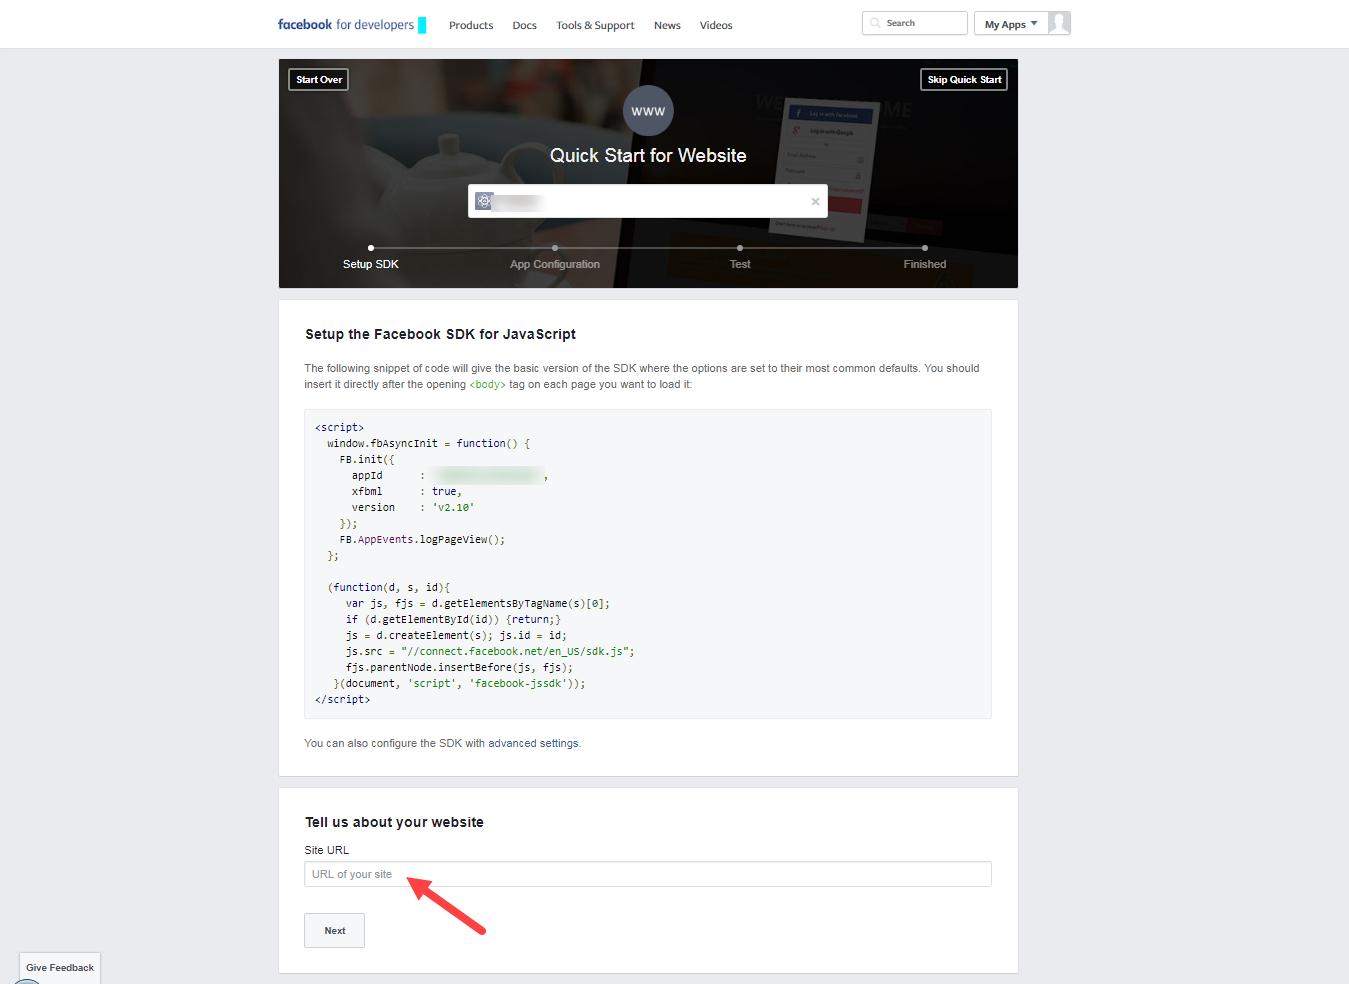 Site Url: Creating A Facebook APP And Enabling Login